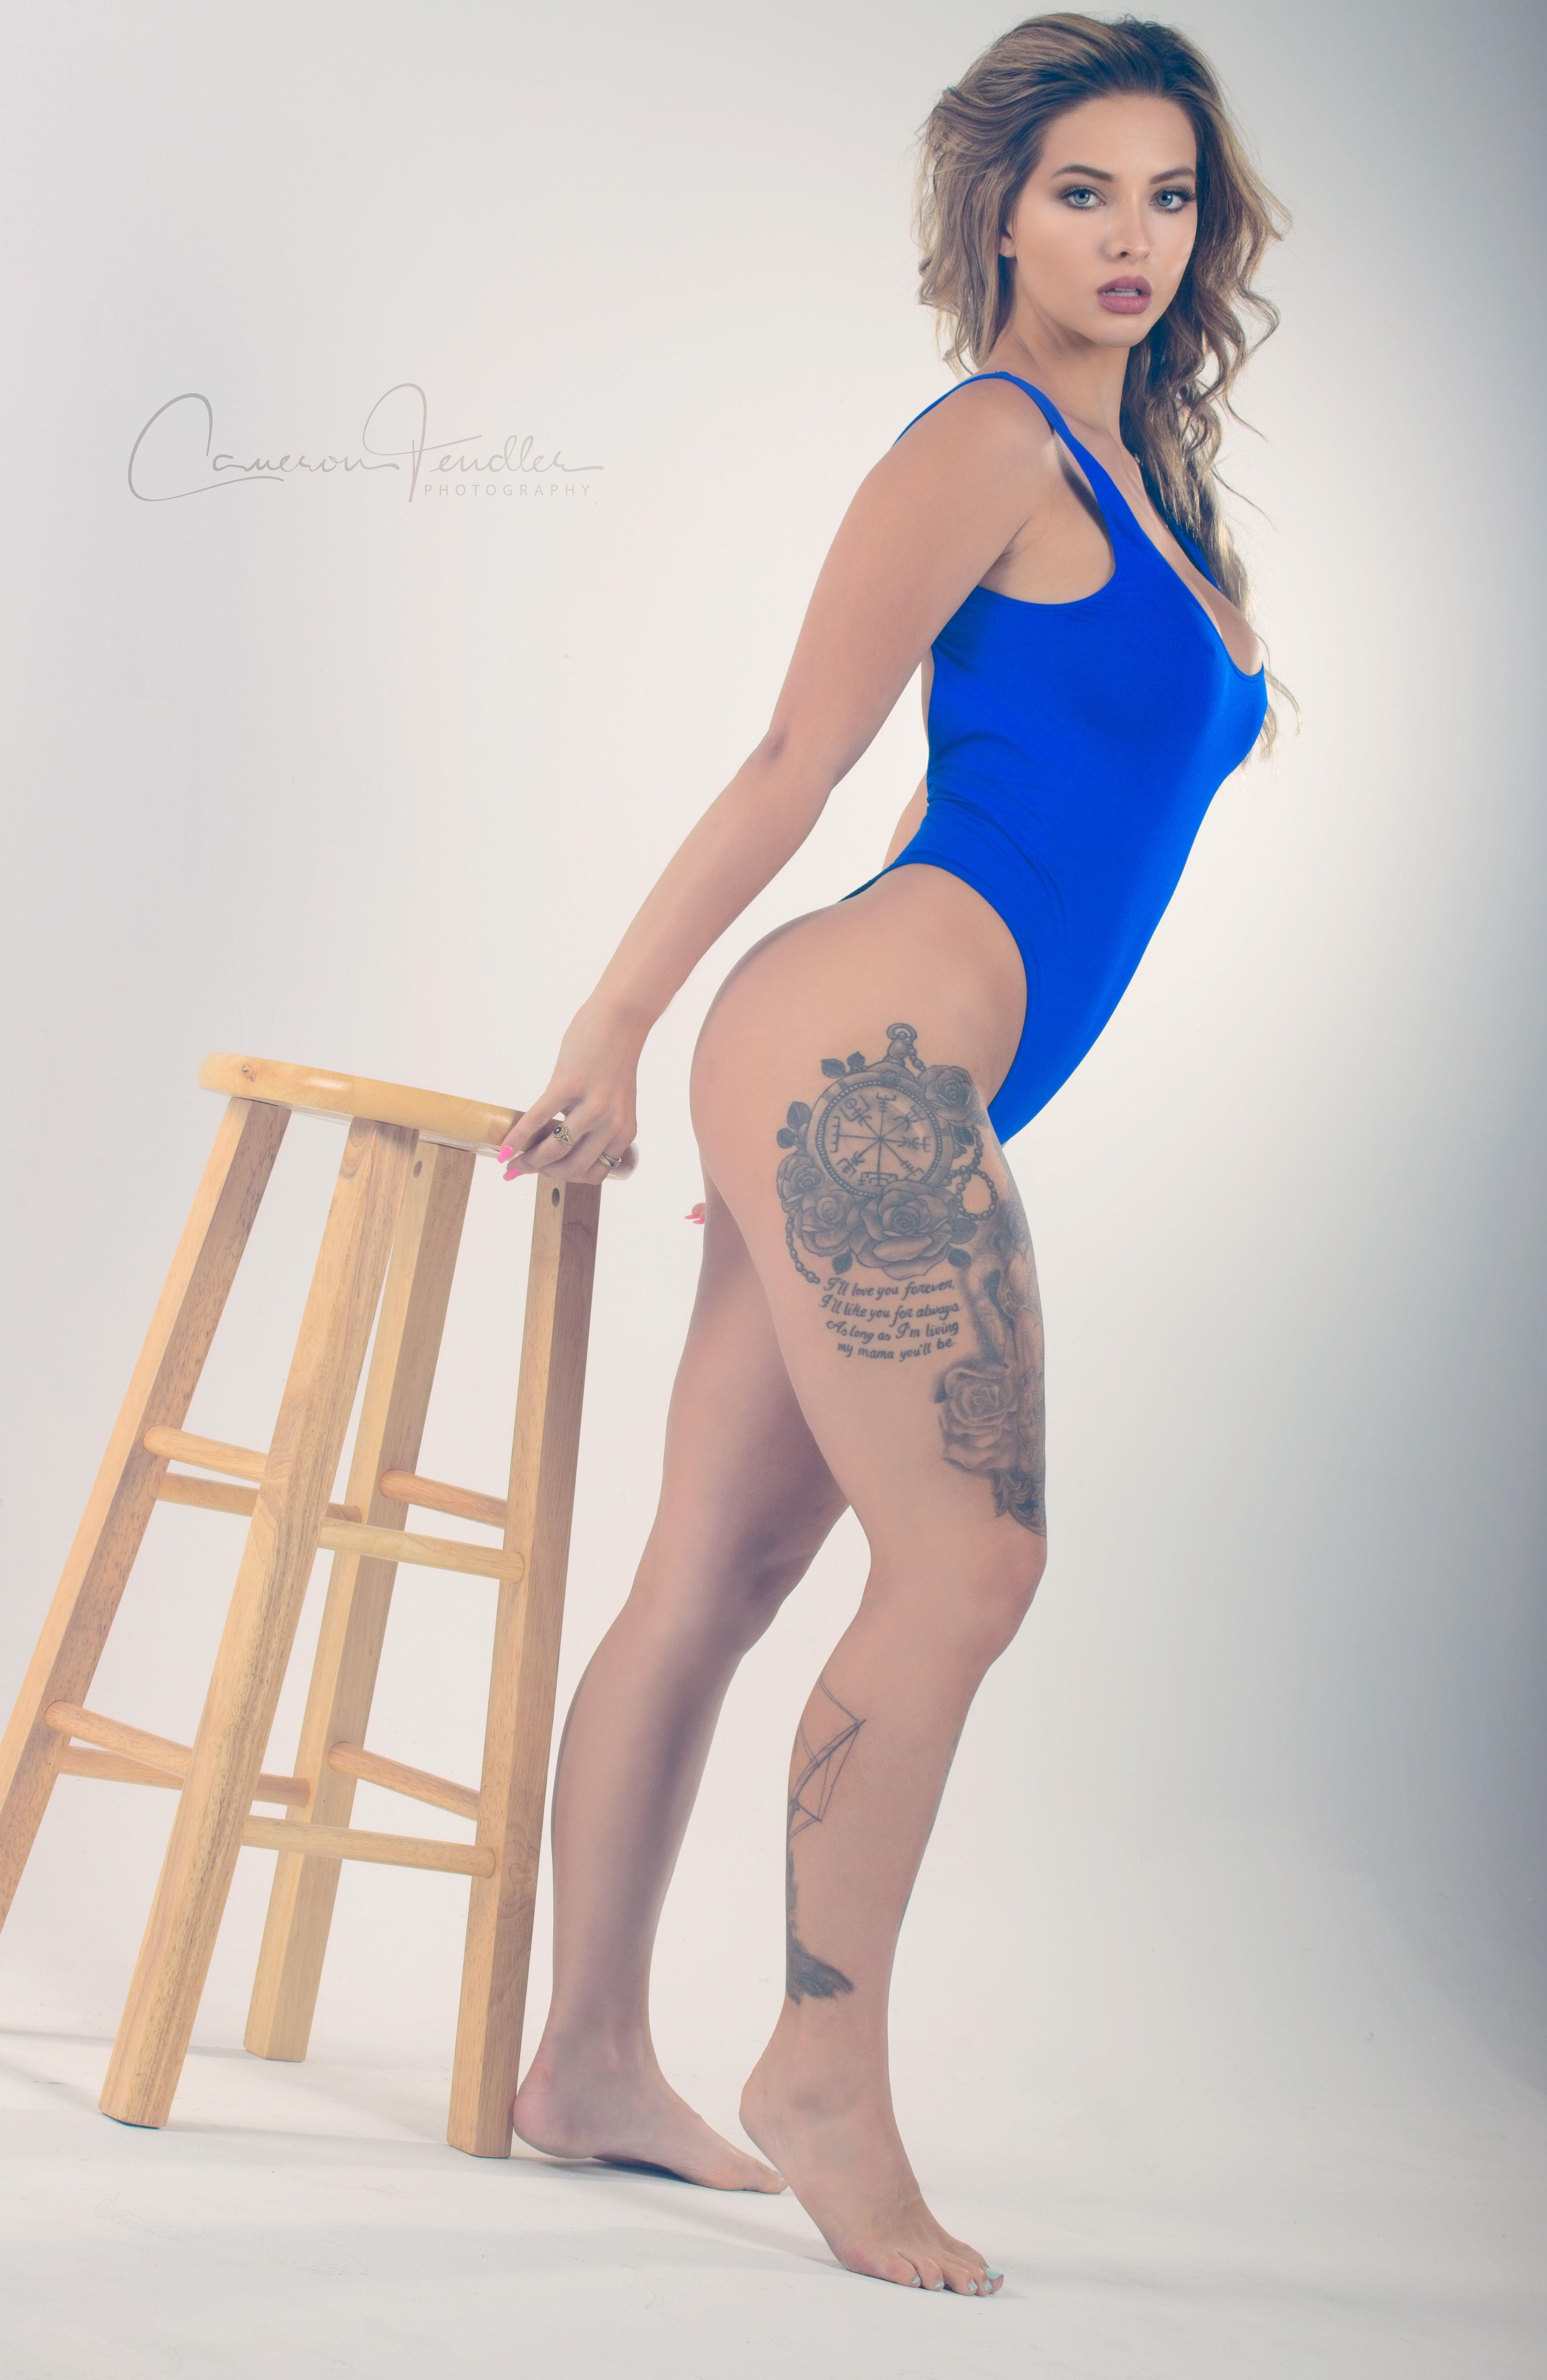 Hacked Ashley Resch nudes (86 photos), Pussy, Bikini, Feet, butt 2015